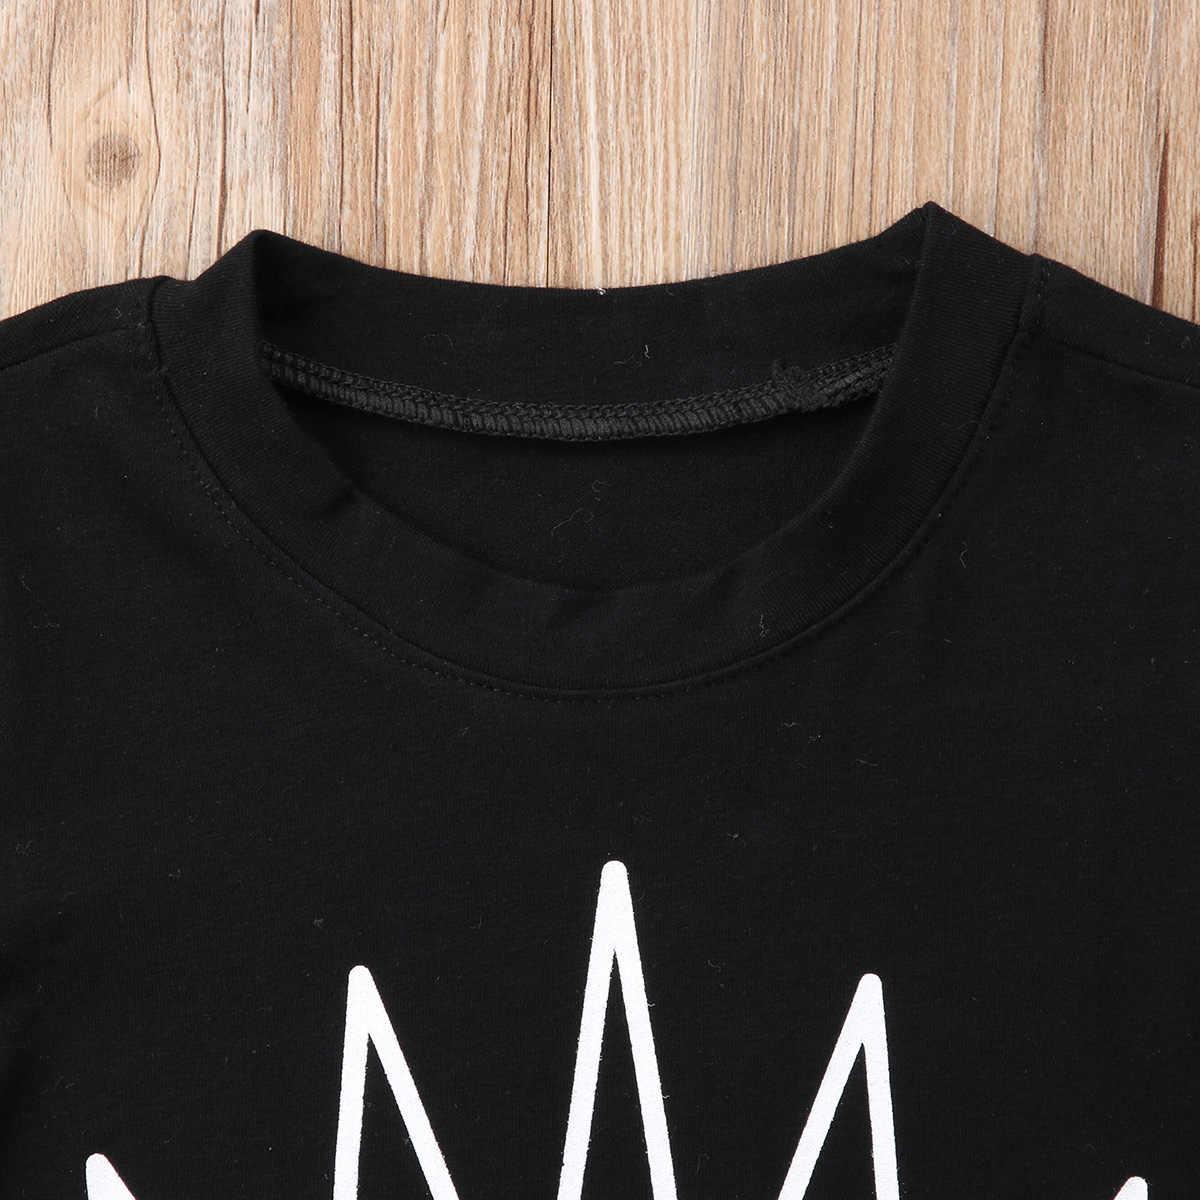 70121886c Baby Girl Black Shirts - DREAMWORKS